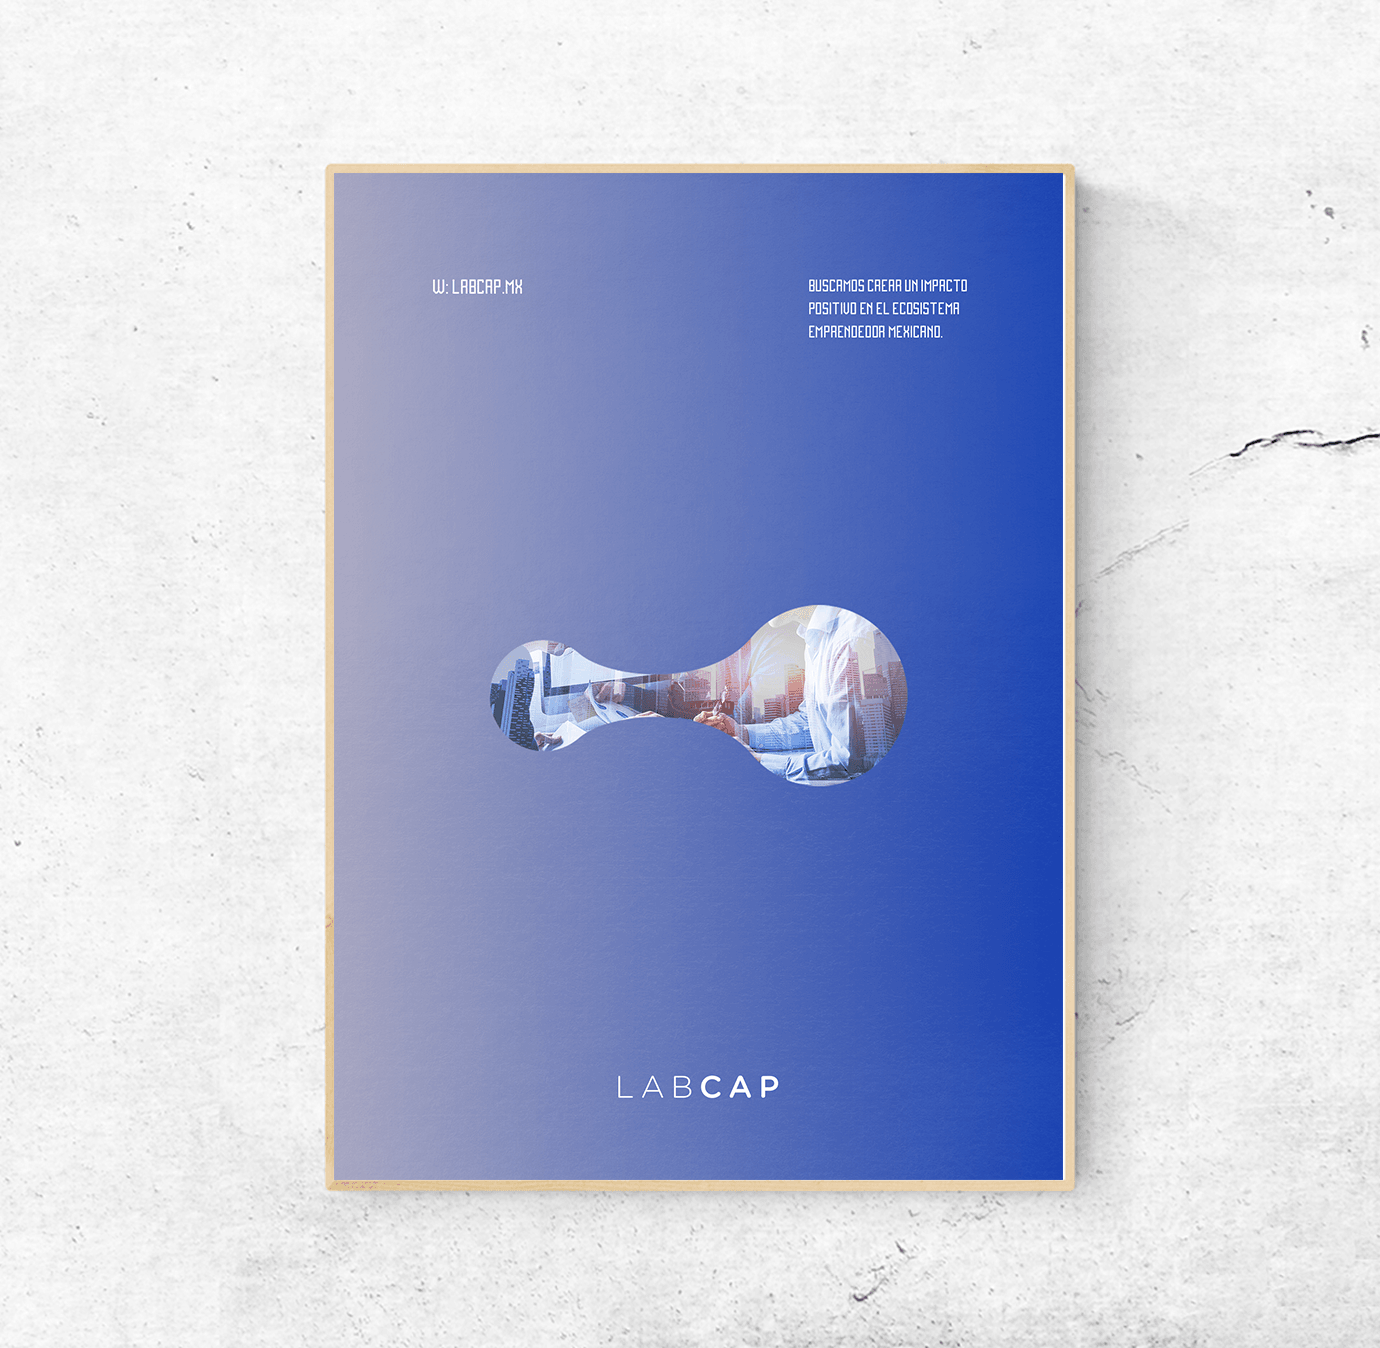 poster-02-labcap-yoenpaperland-compressor